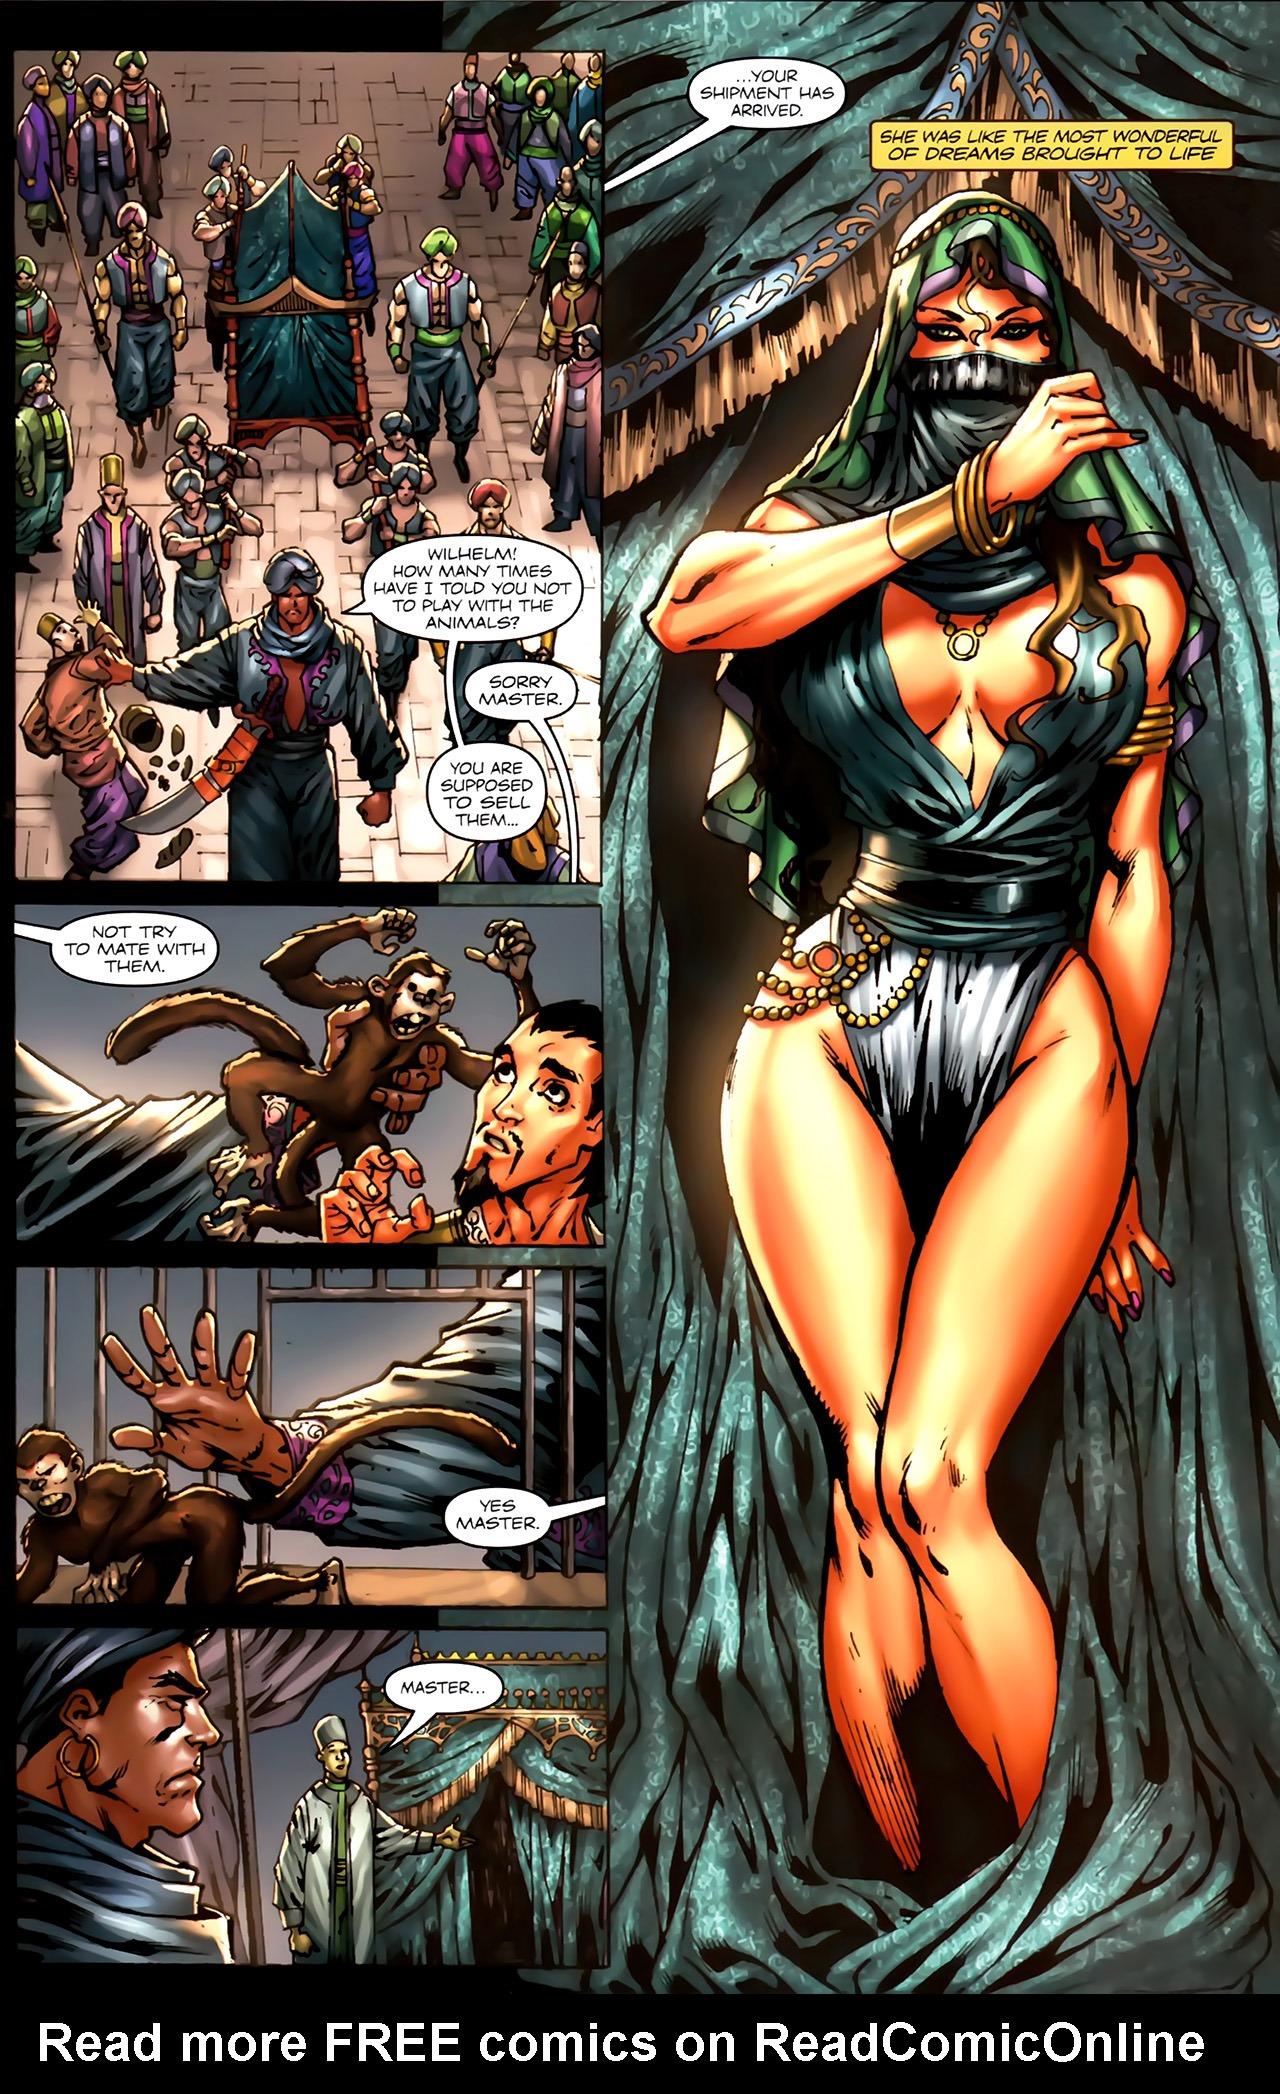 Read online 1001 Arabian Nights: The Adventures of Sinbad comic -  Issue #7 - 6